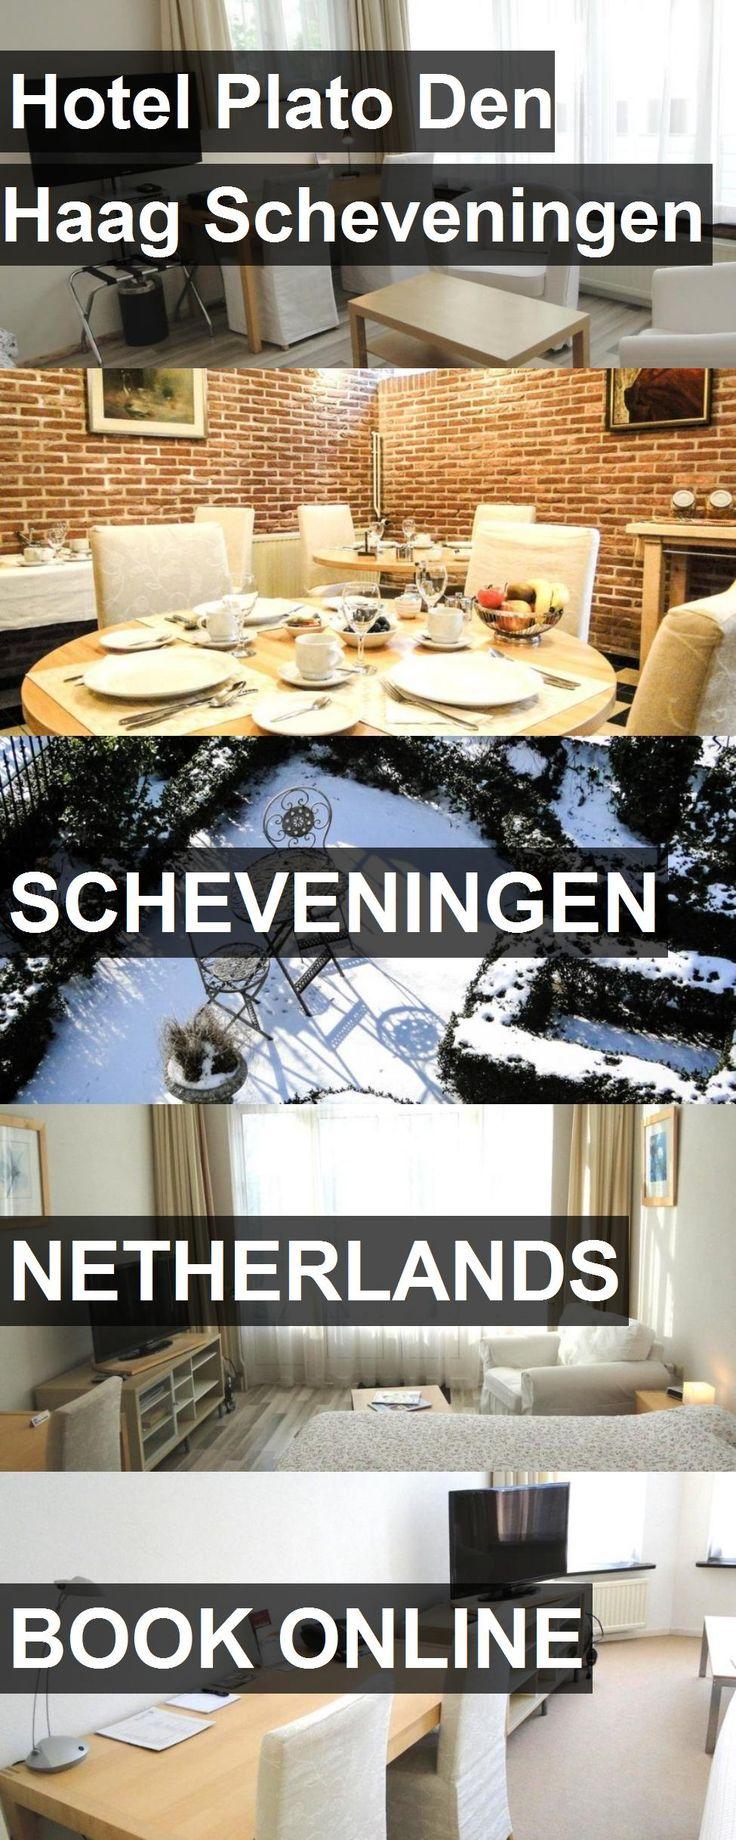 Hotel Plato Den Haag Scheveningen in Scheveningen, Netherlands. For more information, photos, reviews and best prices please follow the link. #Netherlands #Scheveningen #travel #vacation #hotel